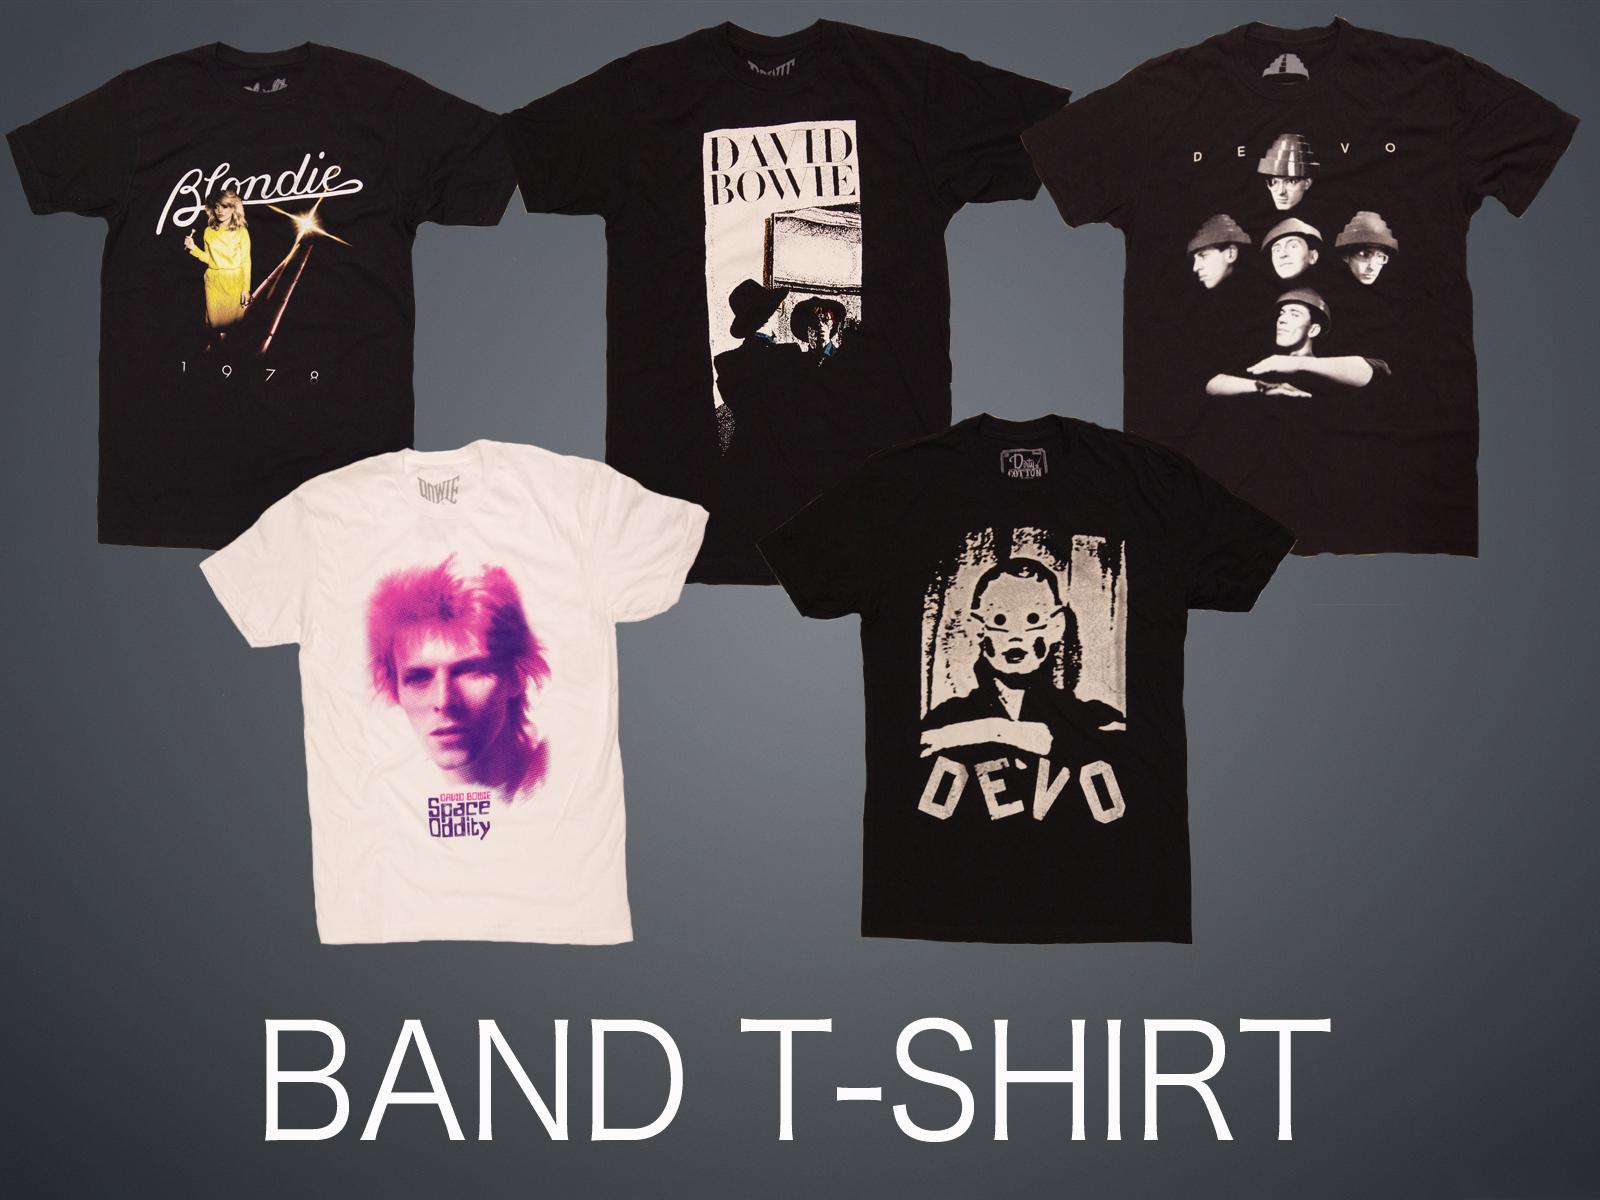 BAND T-SHIRT 70-80's